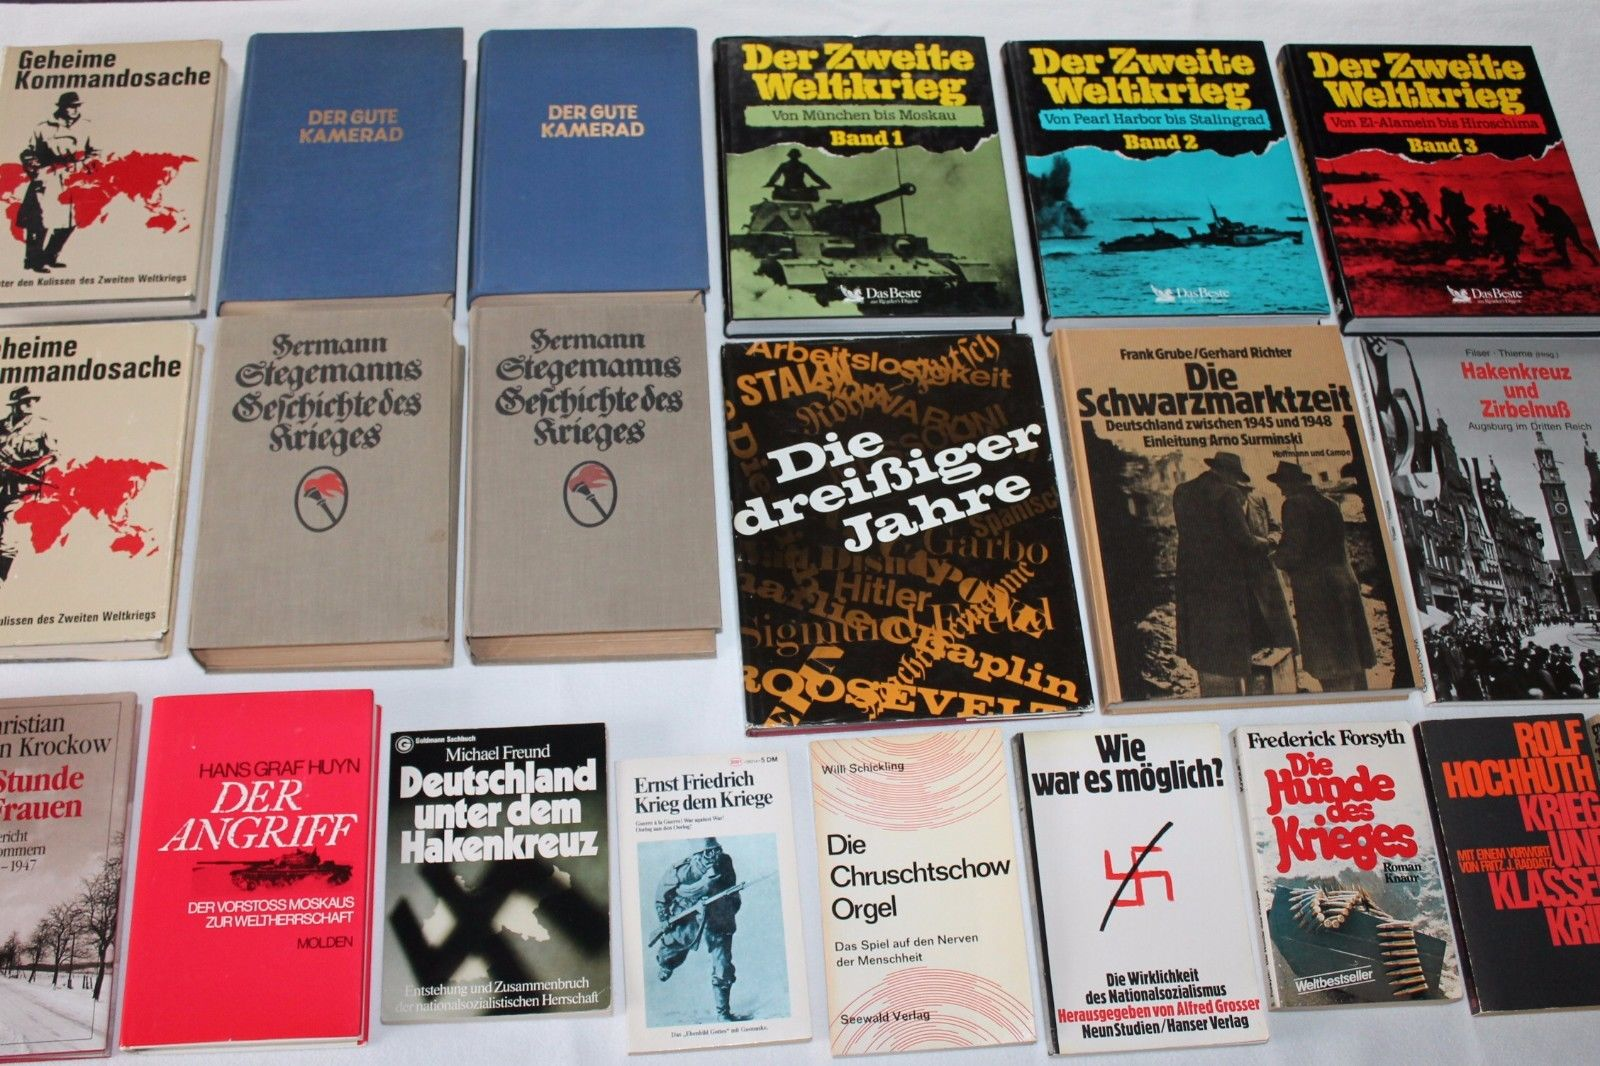 21 Bücher Sammlung, Zweiter Weltkrieg, Hakenkreuz, Seekrieg, Feldzug,Schwarzmark